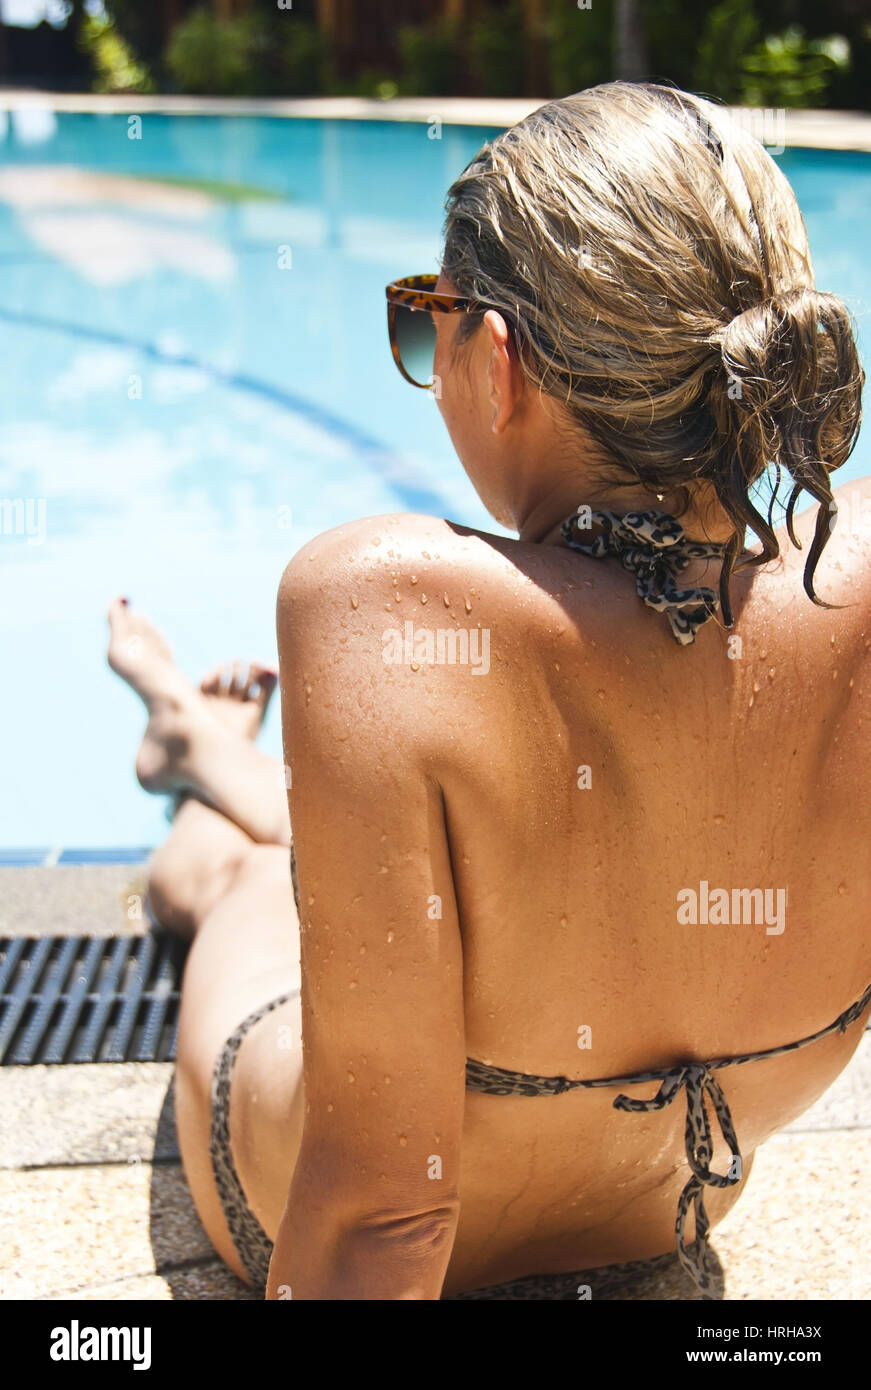 Frau am Pool - woman by the pool - Stock Image